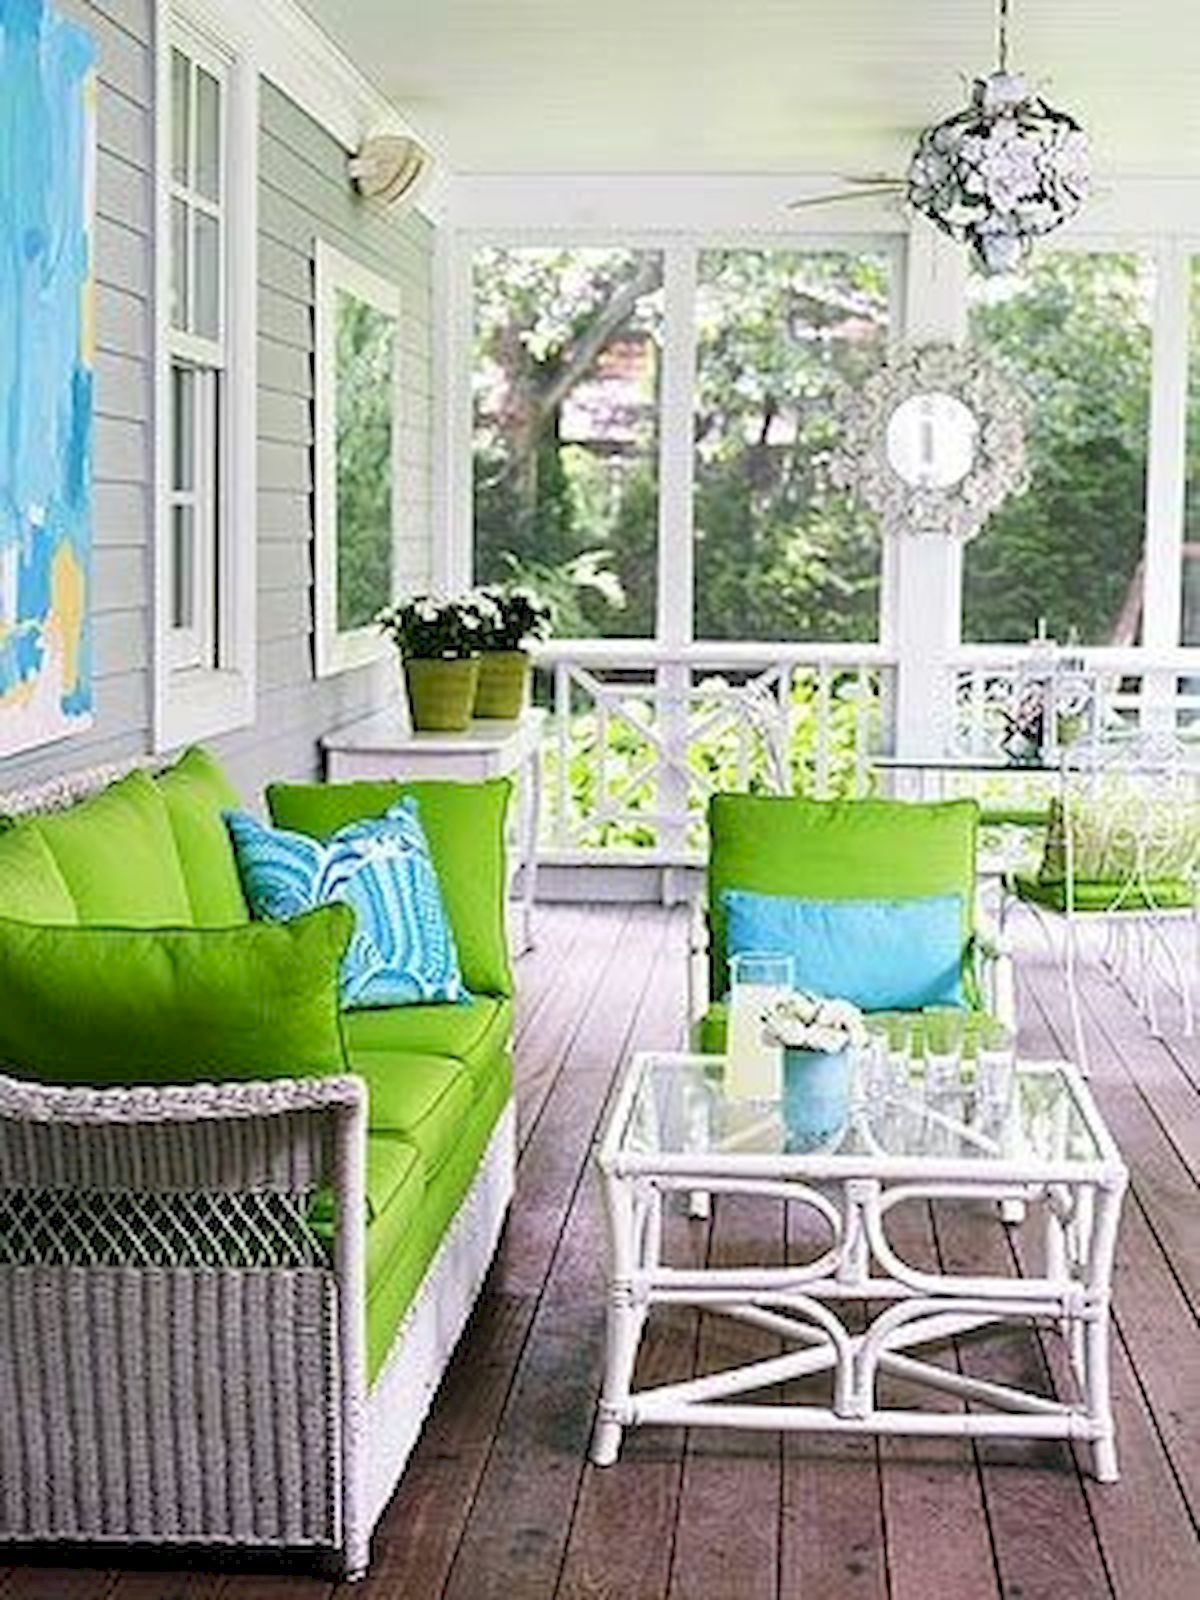 45 Colorful Interior Home Design and Decor Ideas (23)